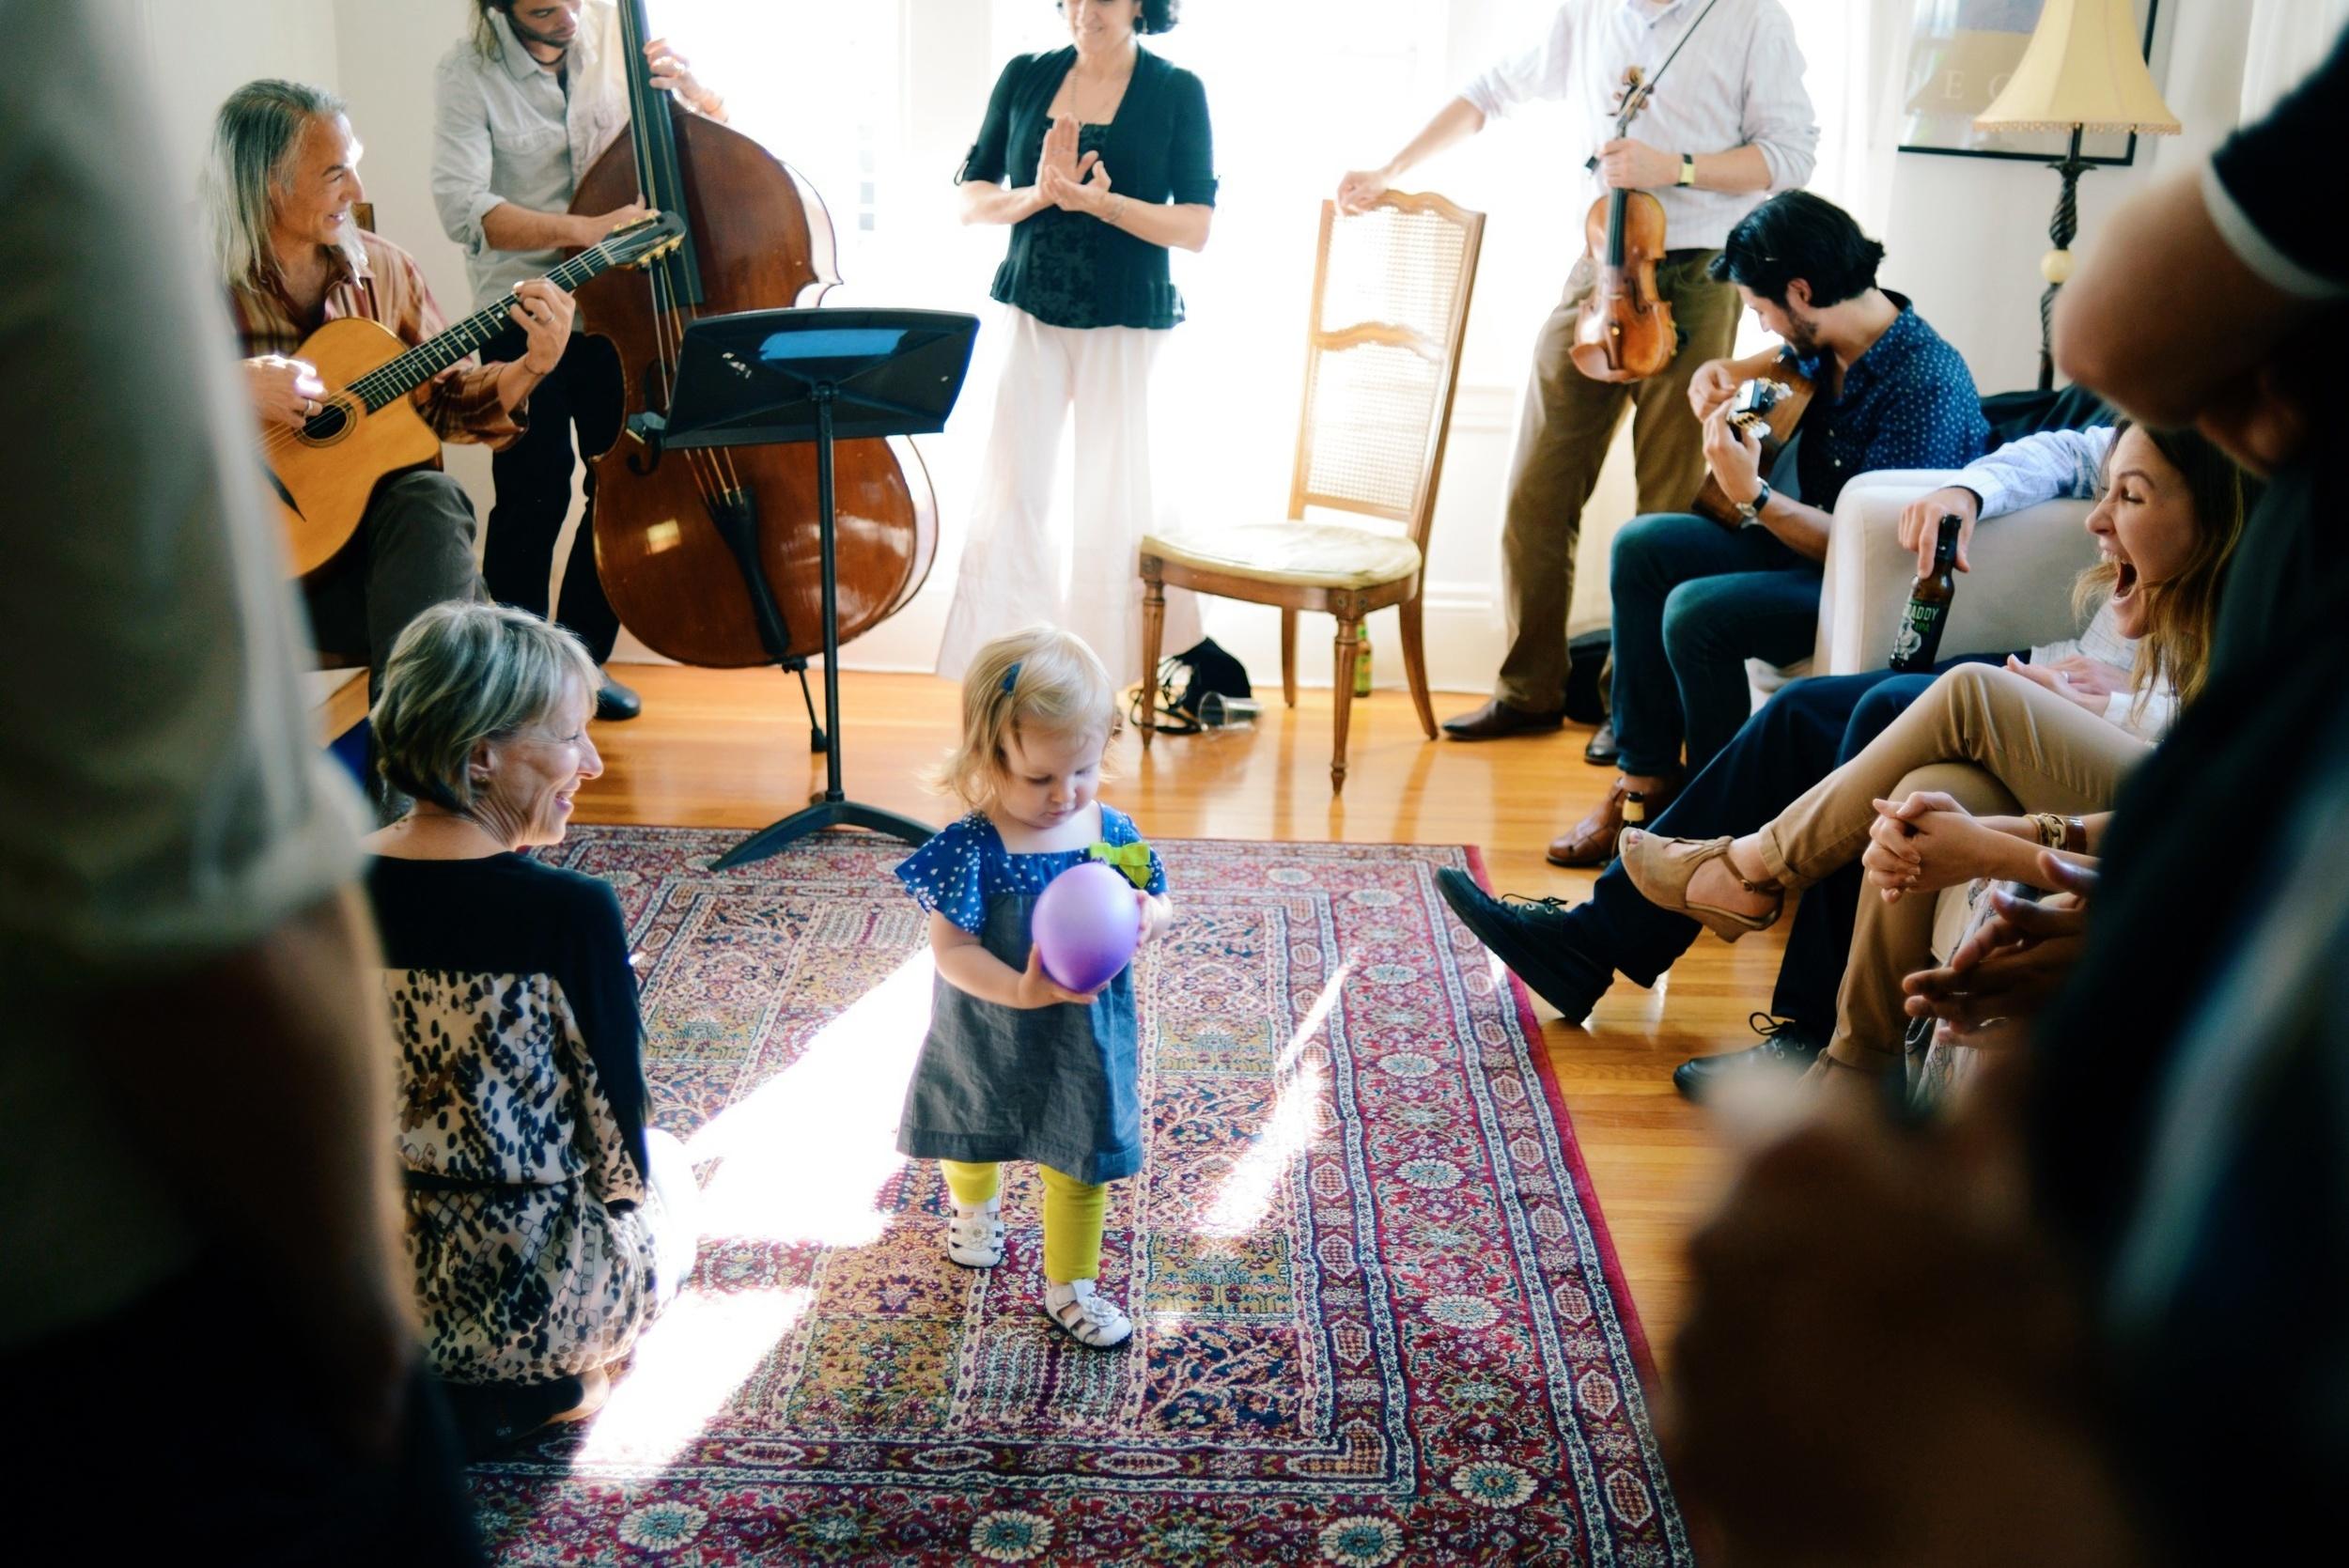 Lila loved the string quartet.